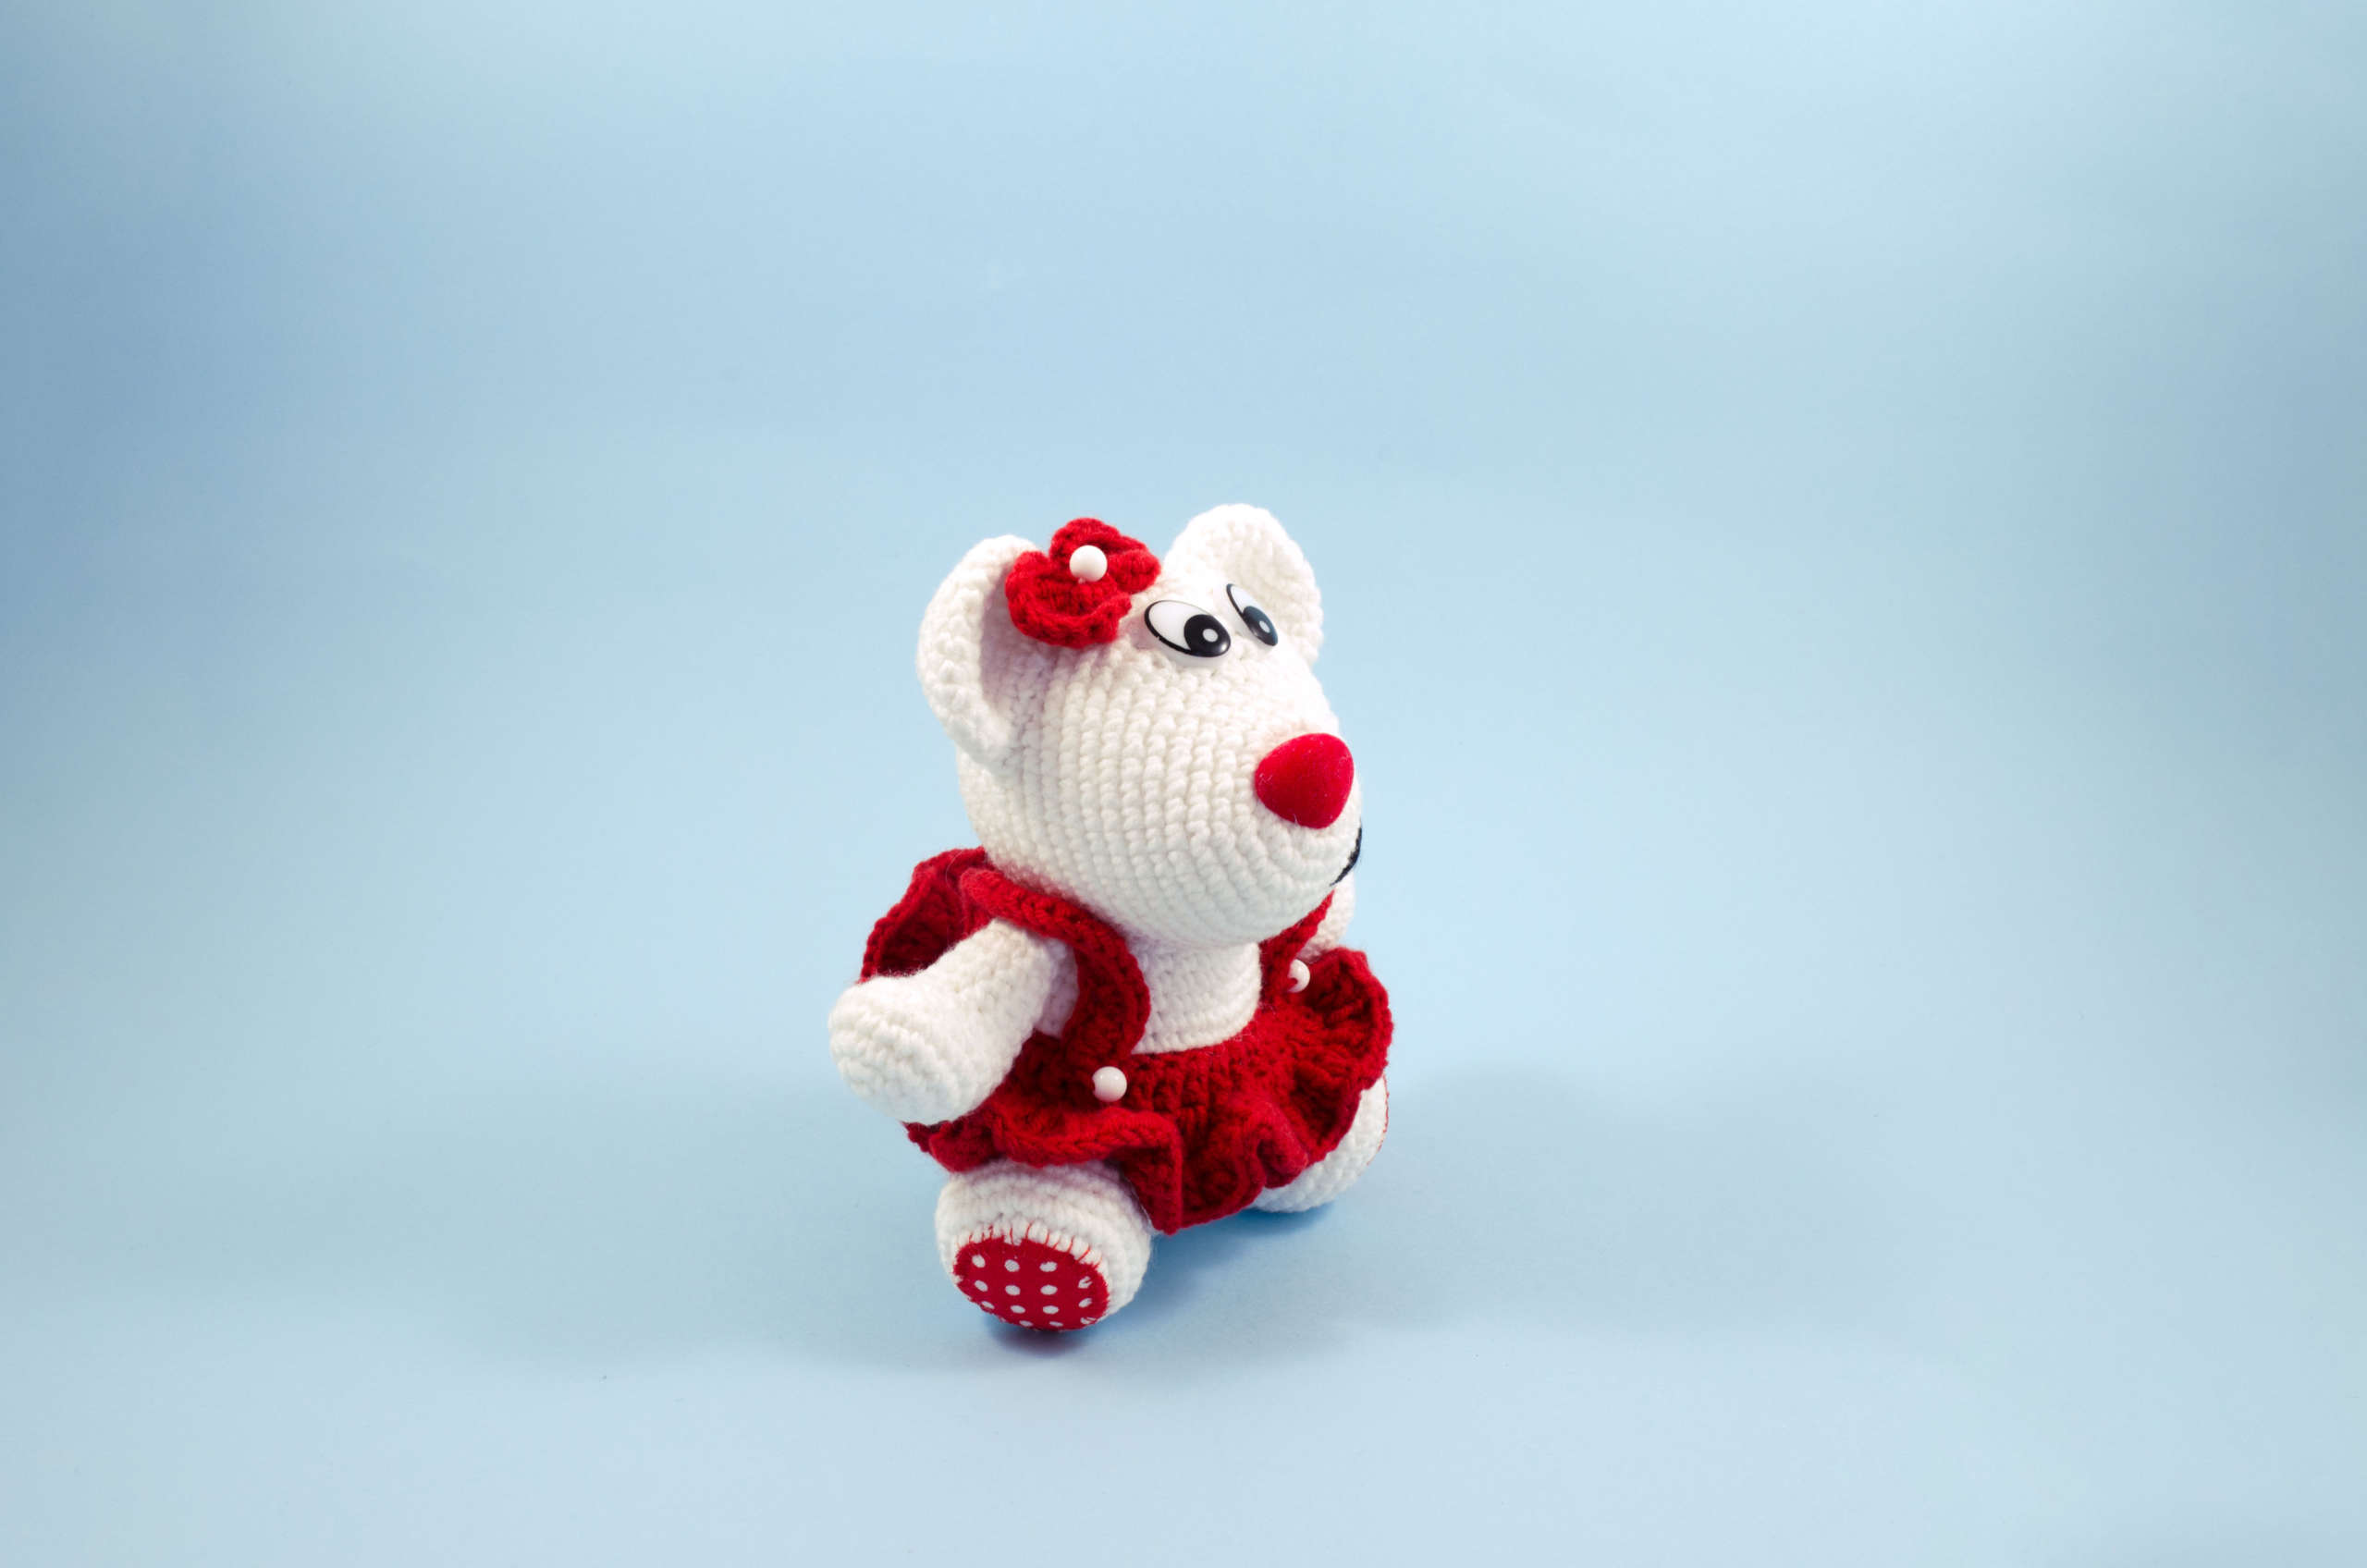 crochet snow white teddy bear side view